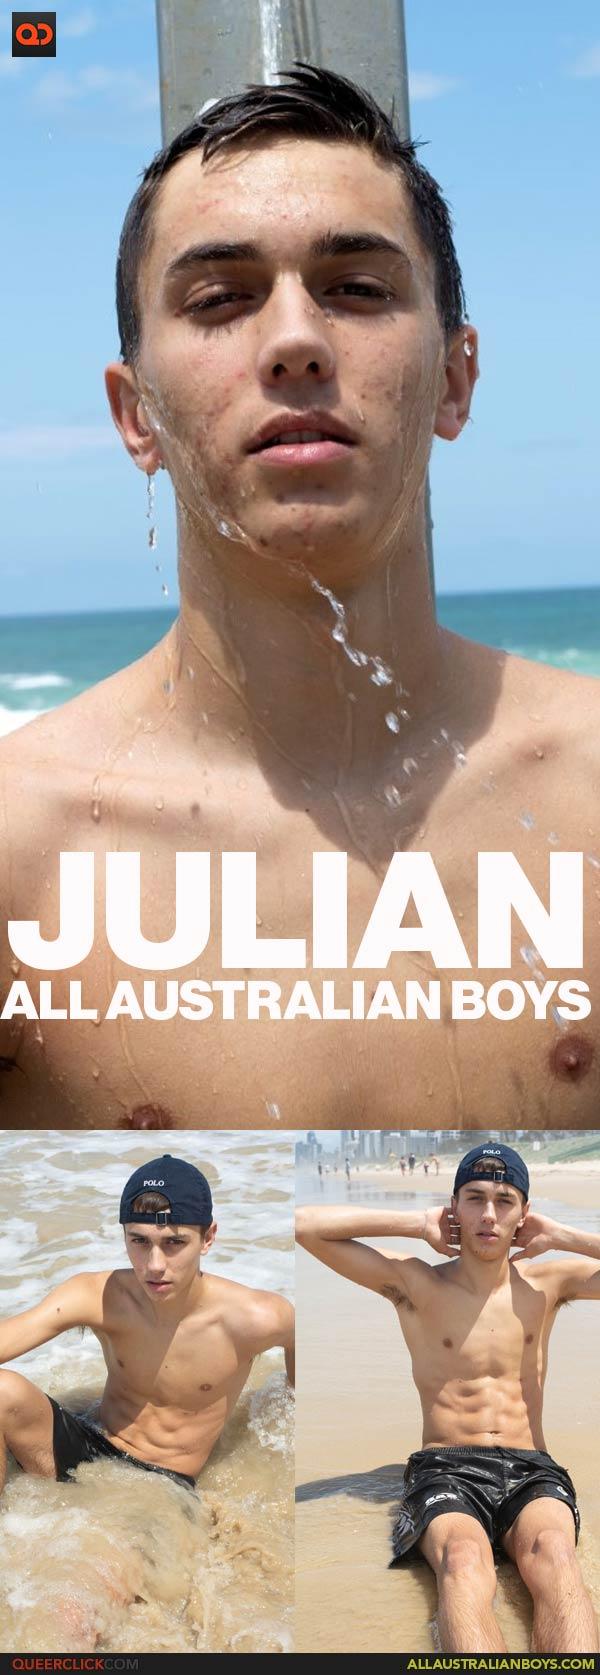 AllAustralianBoys: Julian - EXCLUSIVE 50% MEMBERSHIP DISCOUNT!